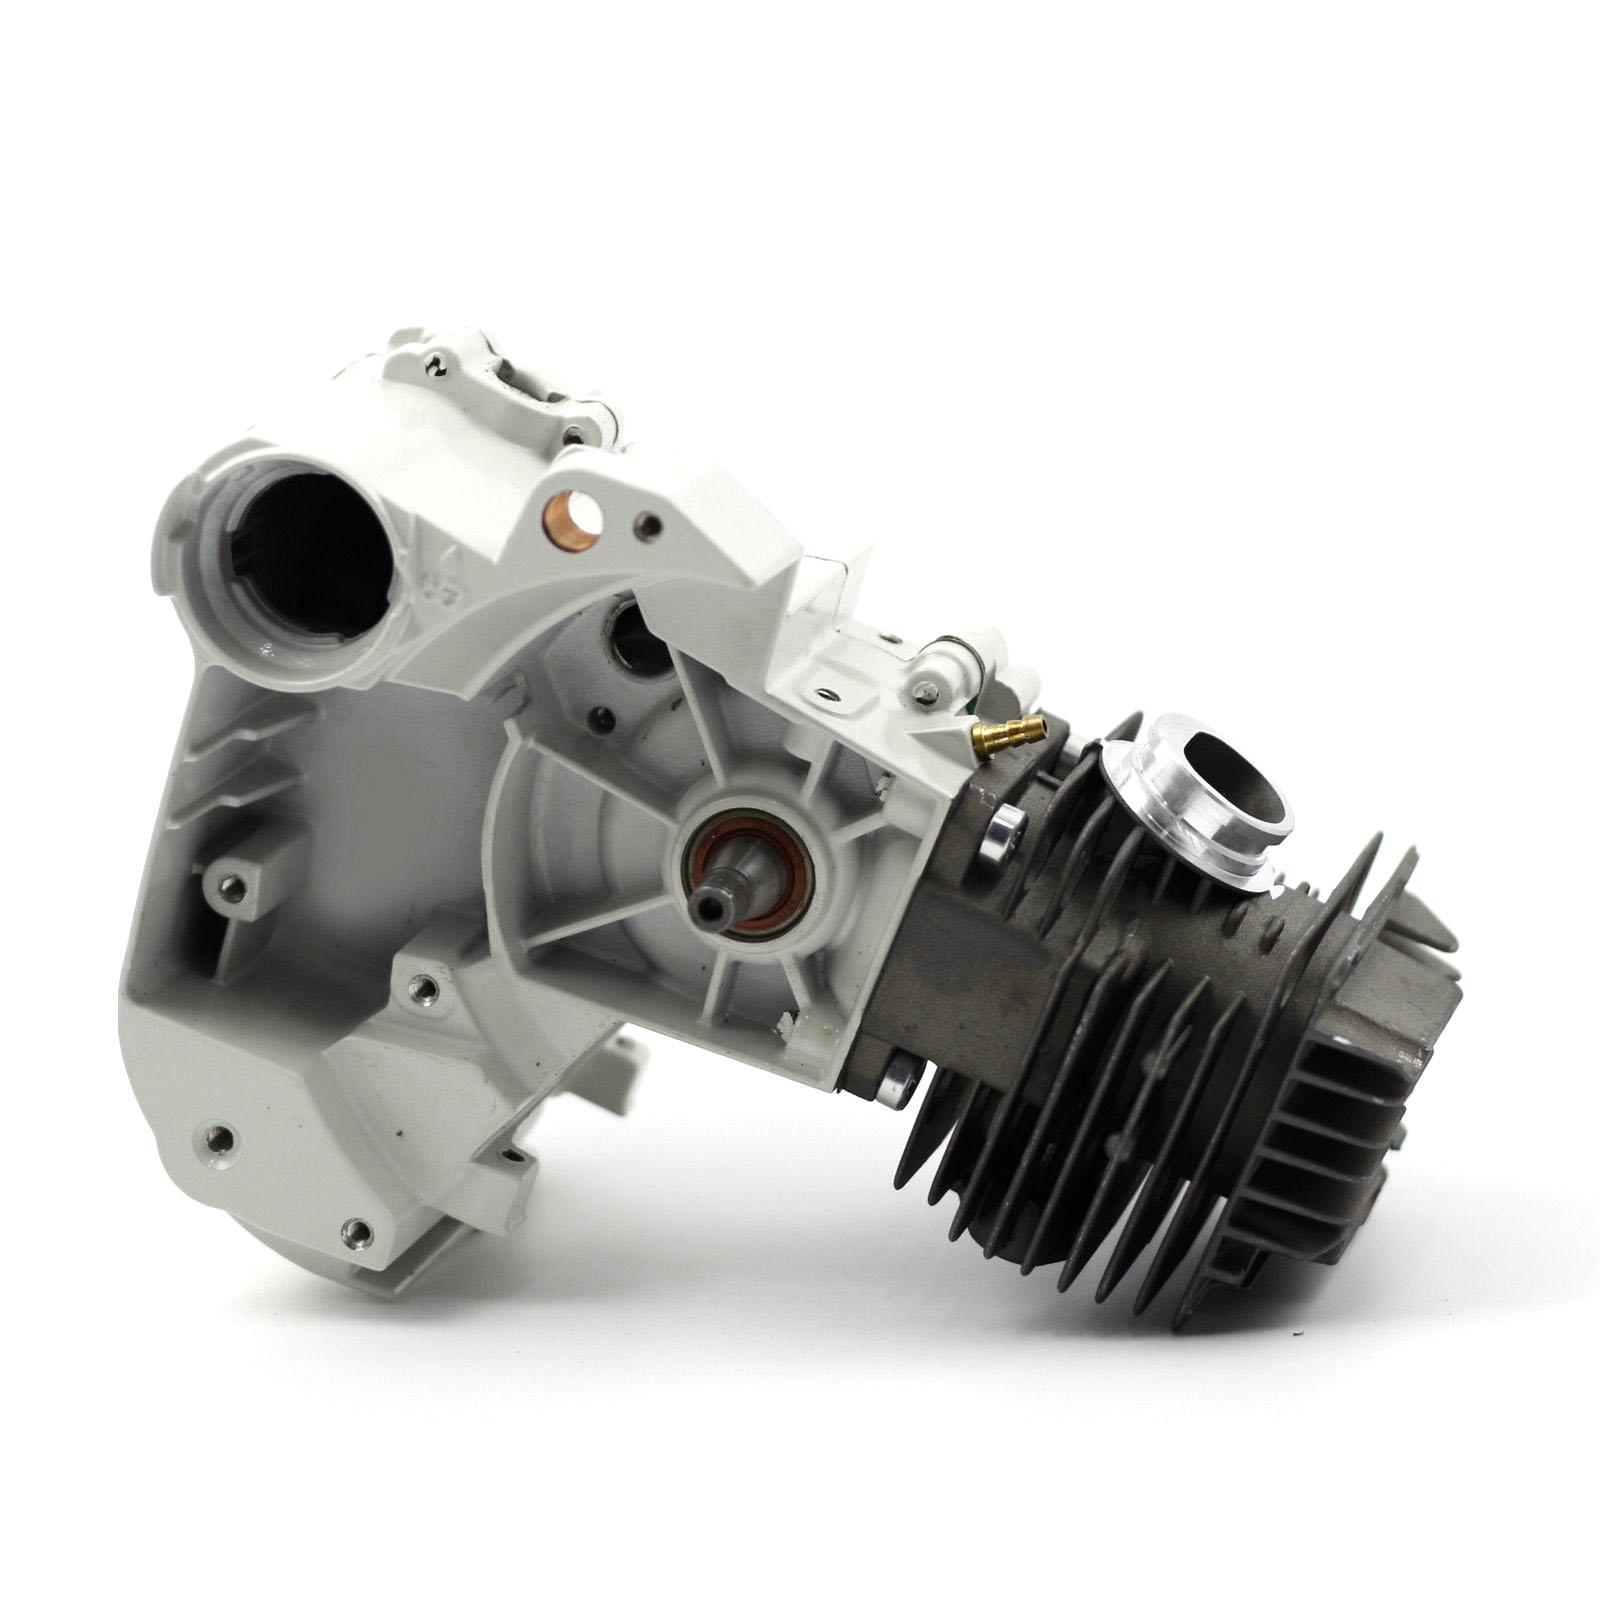 Engine Motor For Stihl Ms200t 020t Ms200 Chainsaw Crankcase Cylinder 044 Parts Diagram Free Image User Piston Crankshaft 1129 020 1202 2601 29031129 030 0400